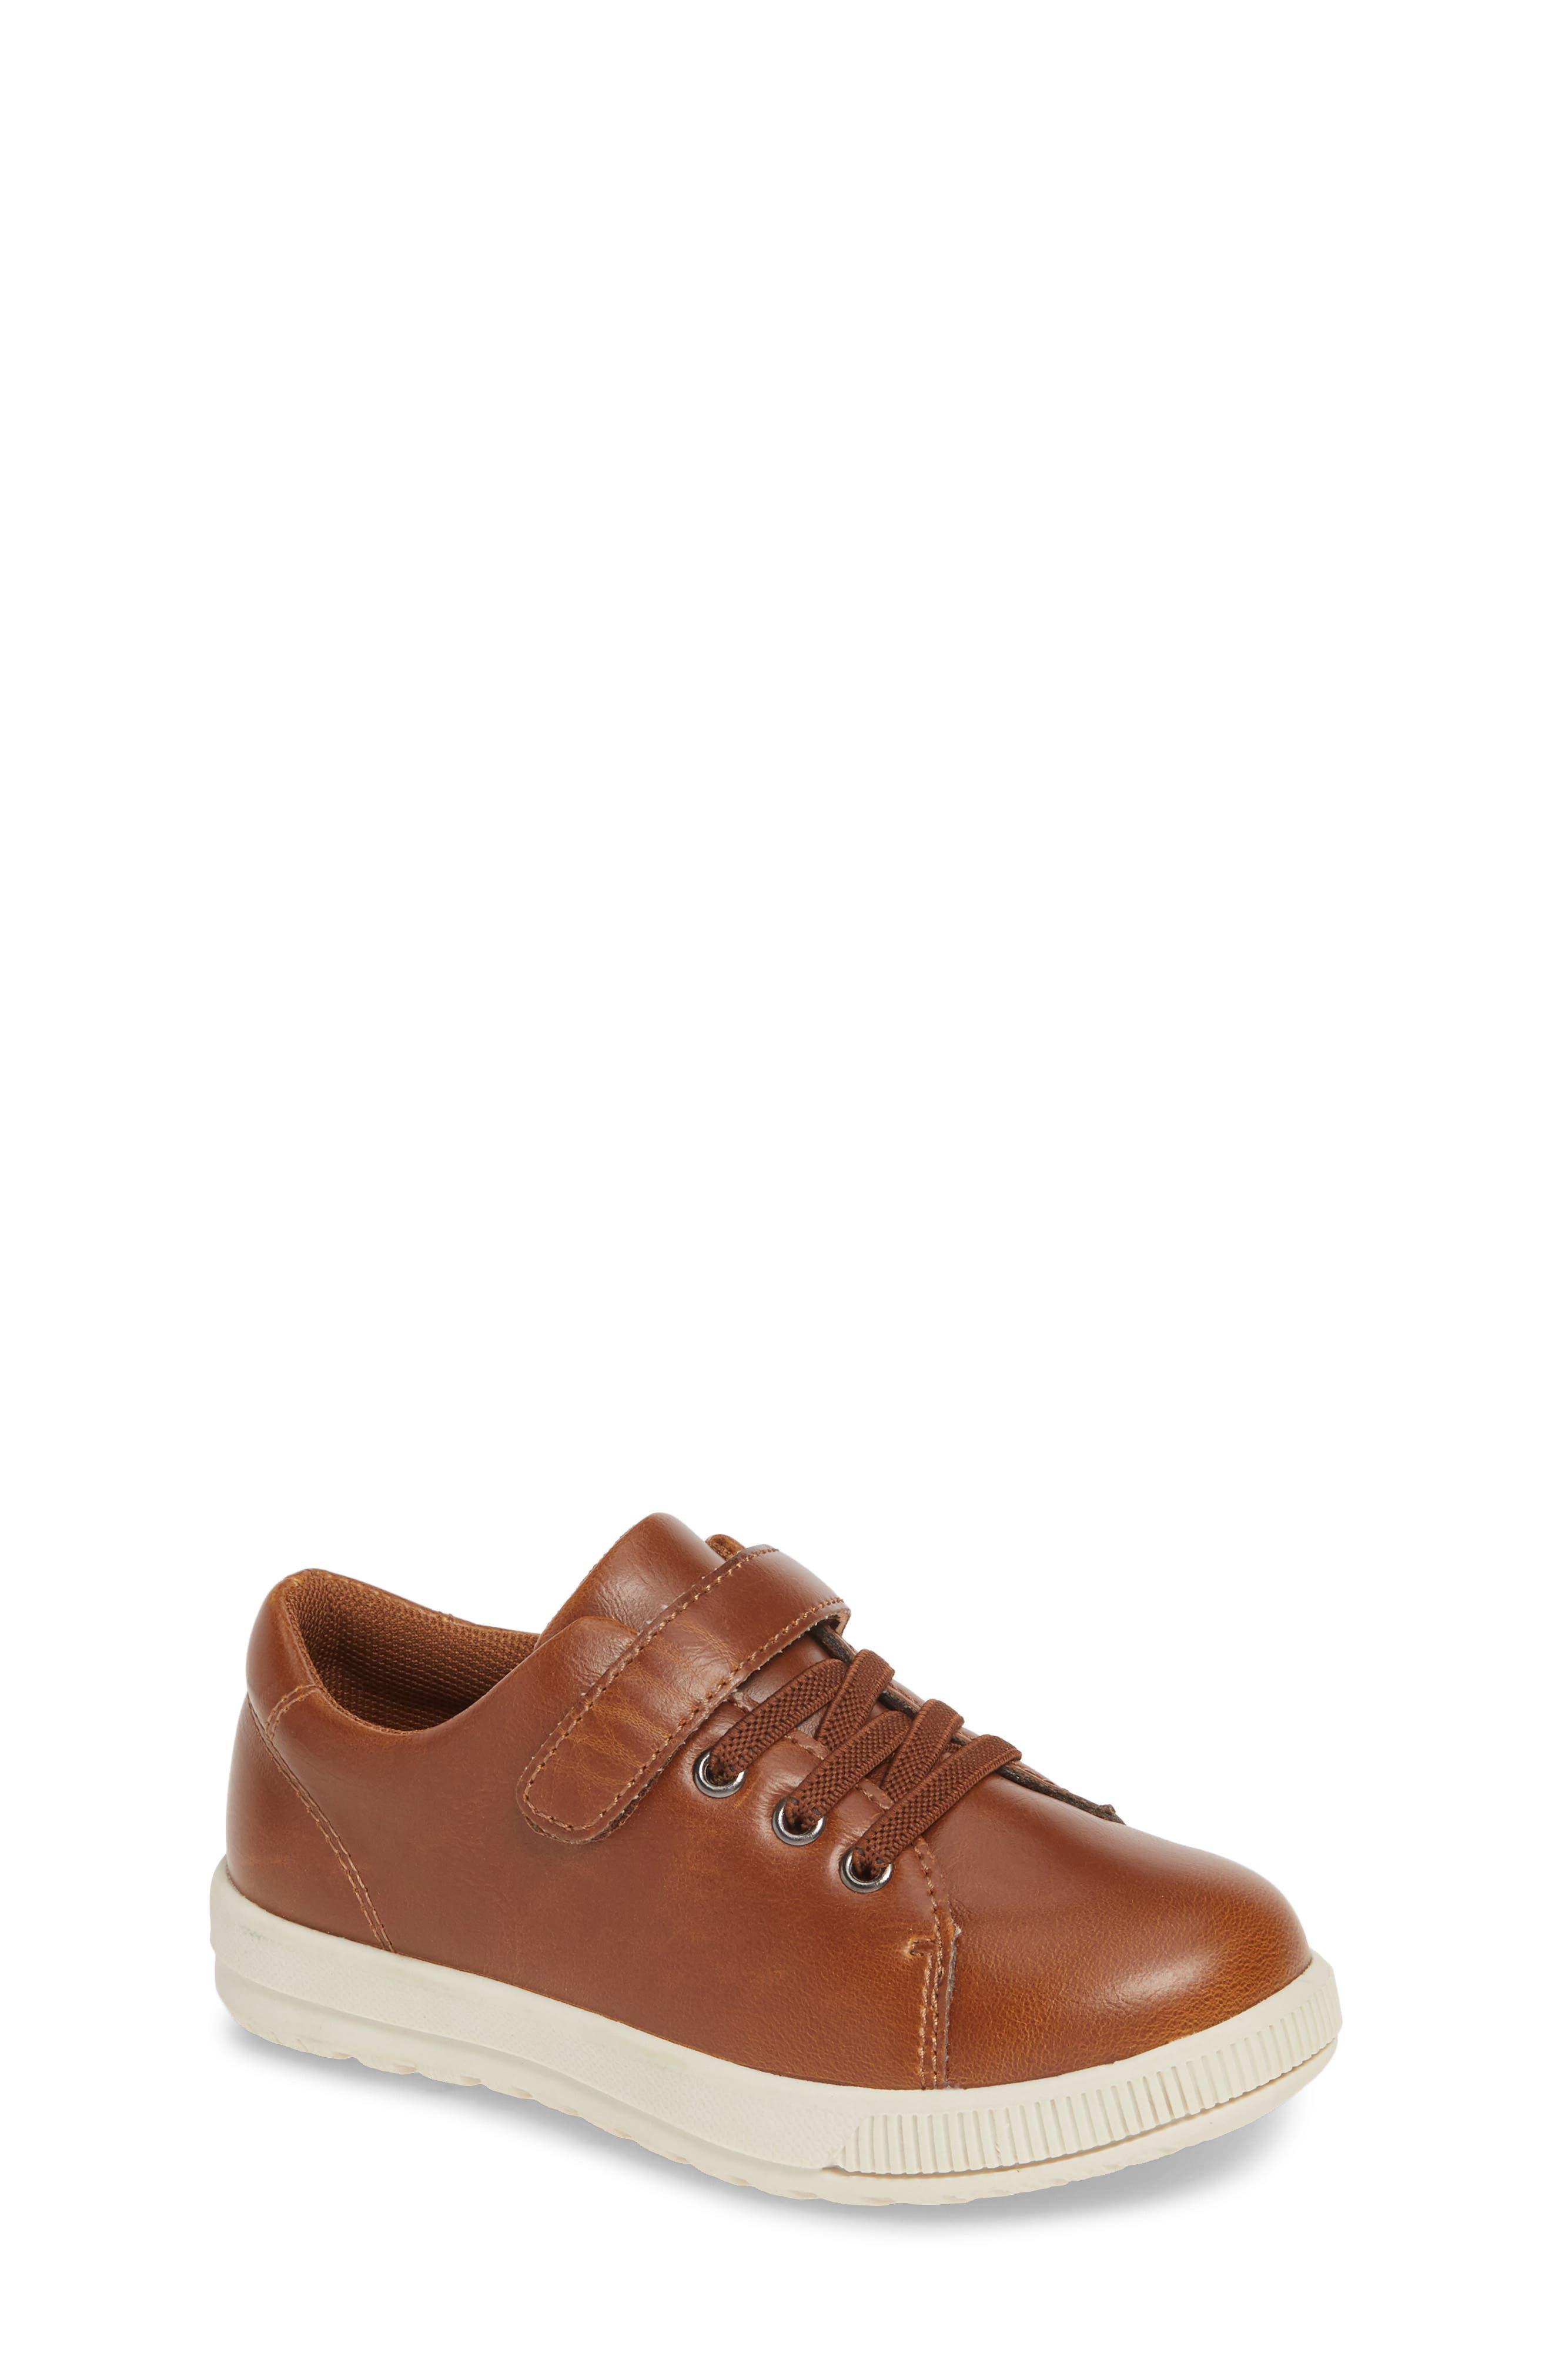 Toddler Boys 1901 Low Top Sneaker Size 8 M  Brown